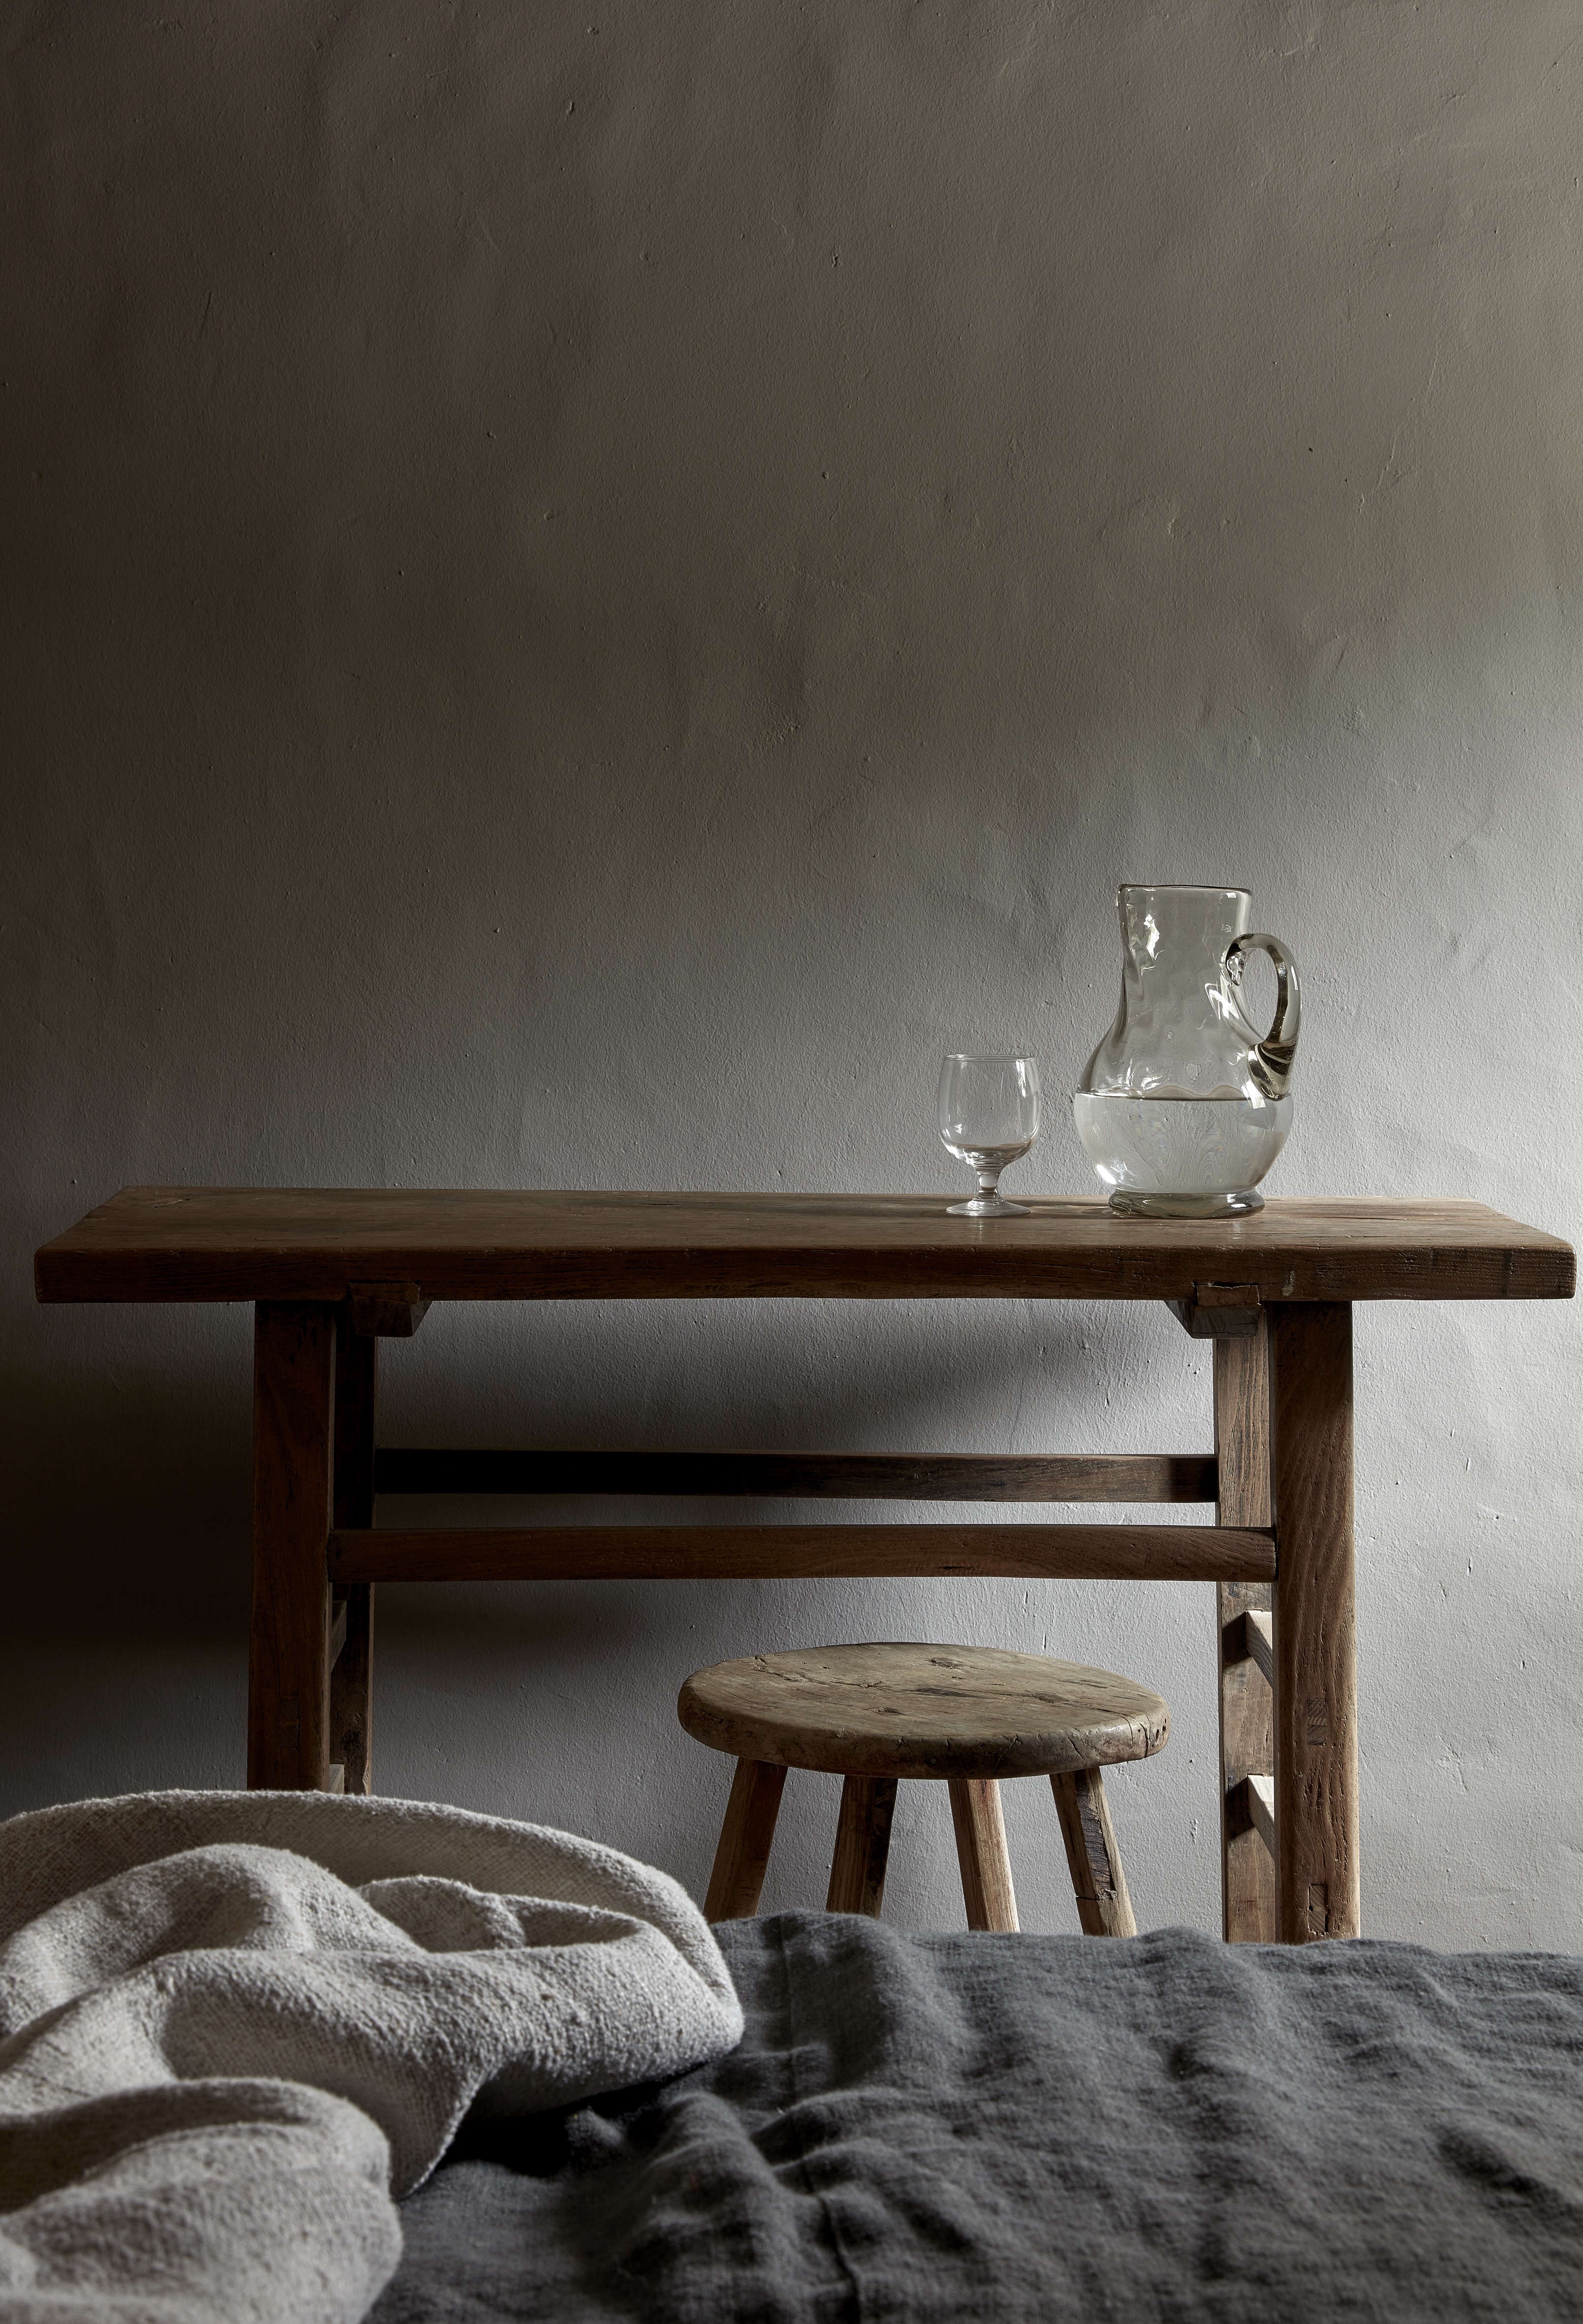 Rustic-luxe furnishings at La Granja Ibiza, a new Design Hotels retreat | Remodelista